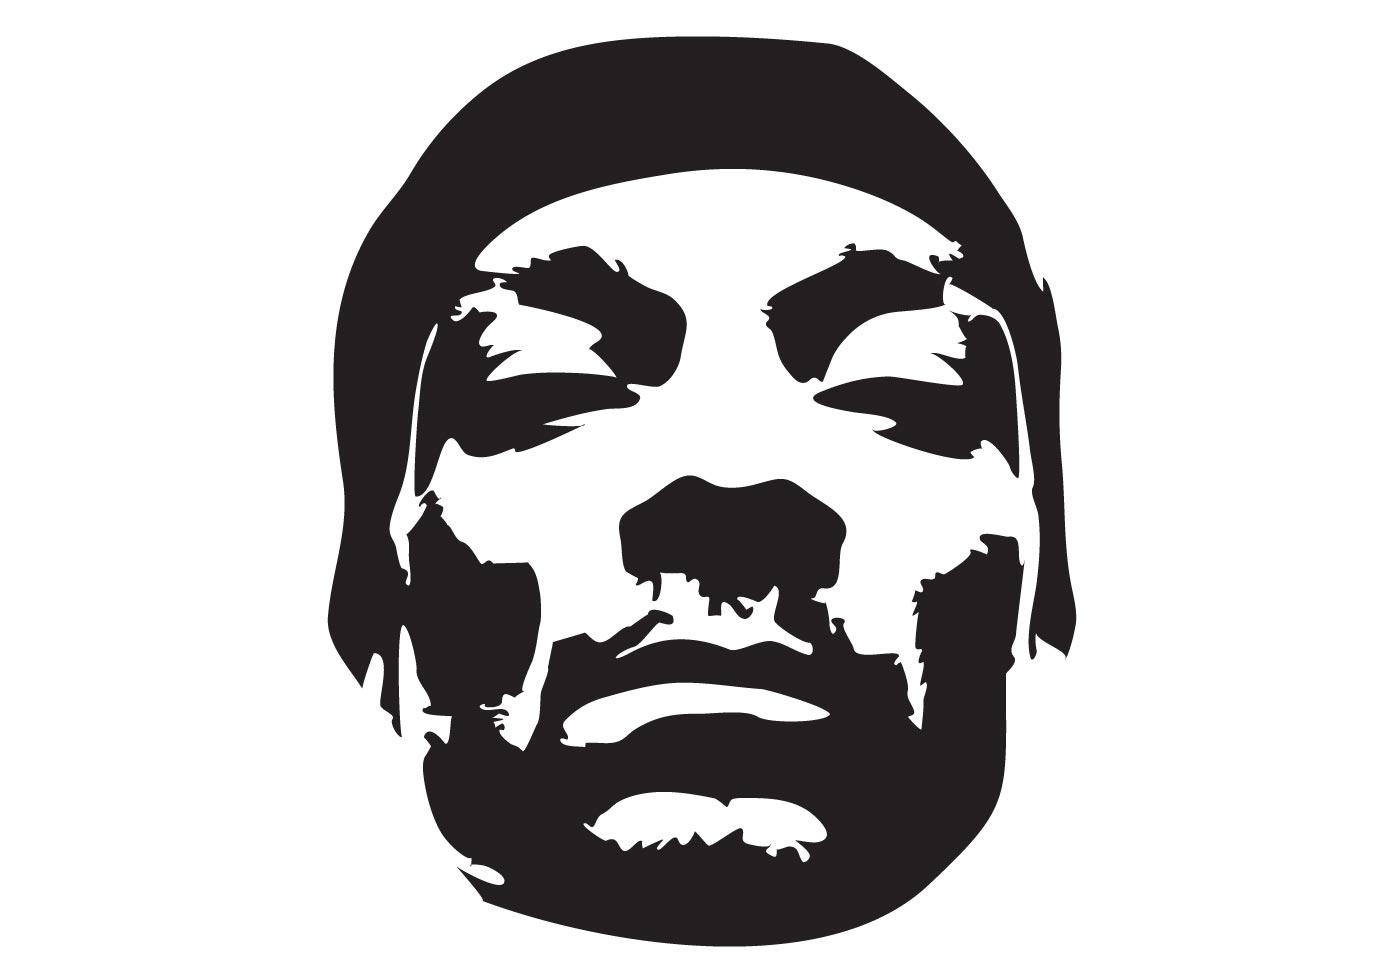 Free Snoop Dogg Vector From Vecteezy